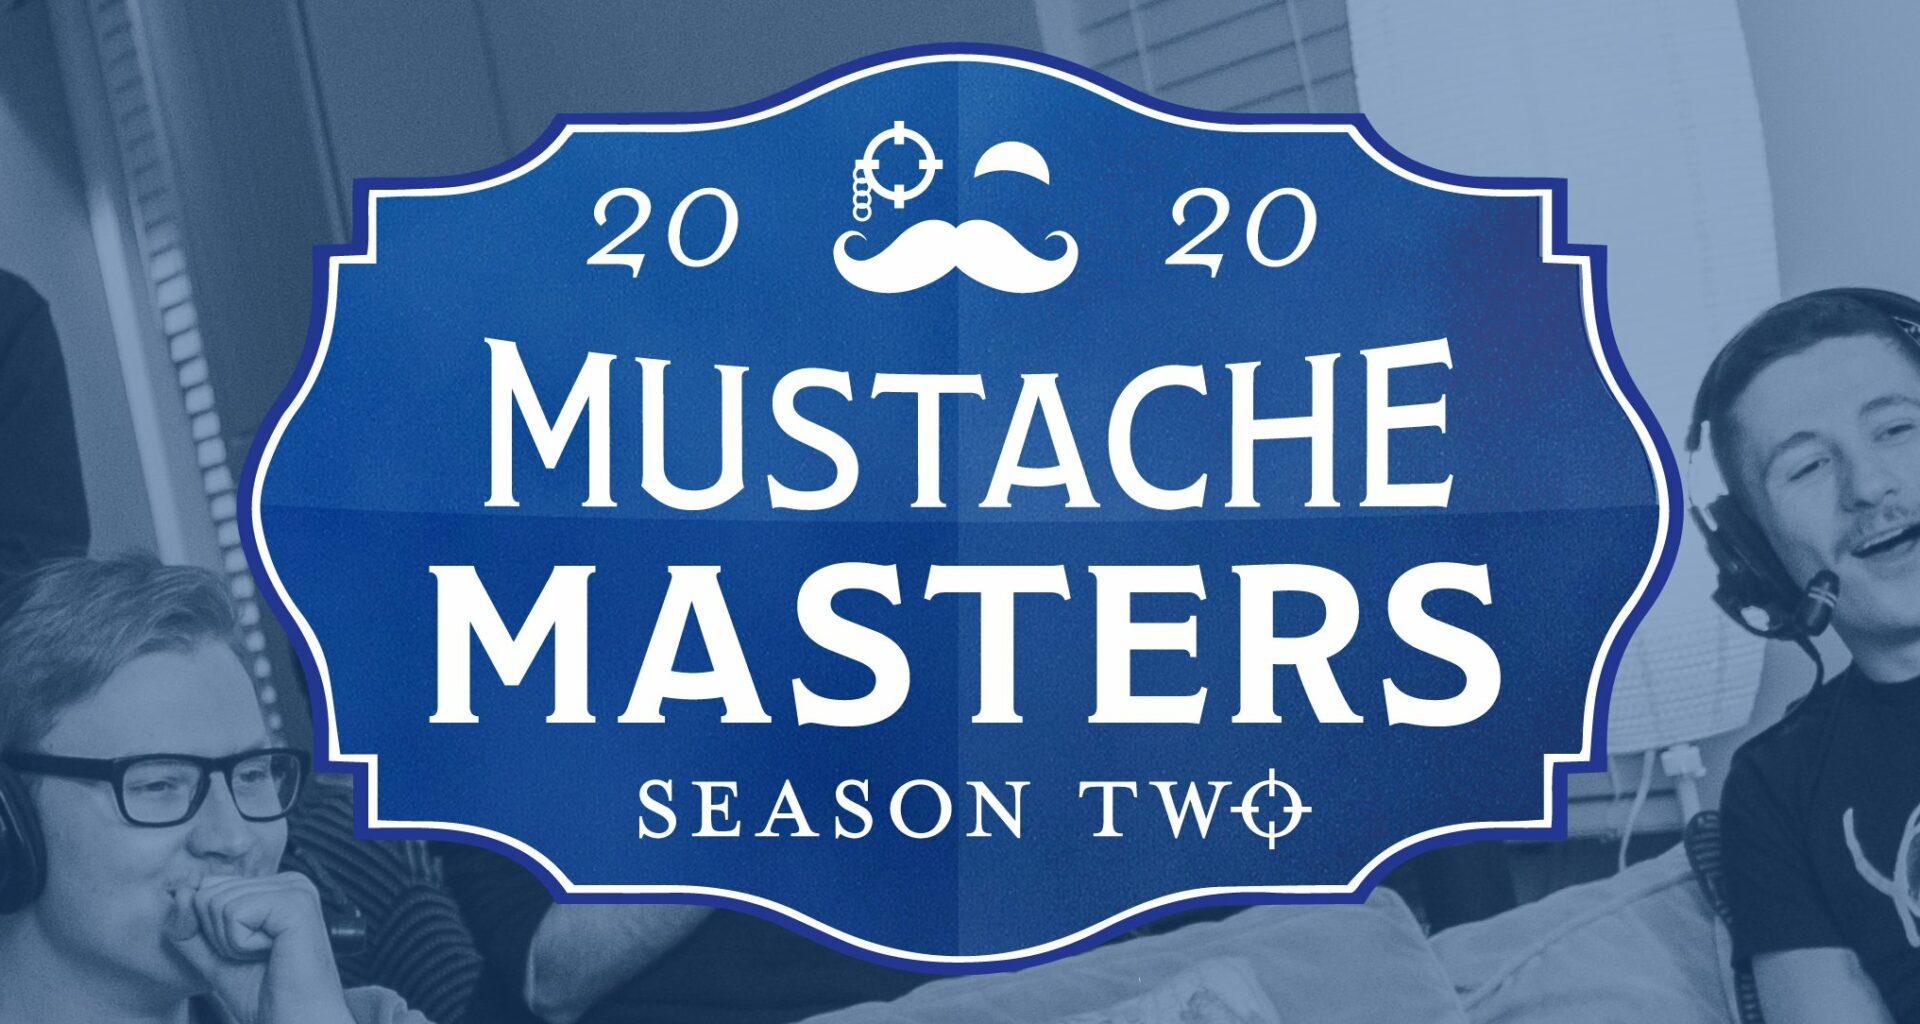 Mustache Masters